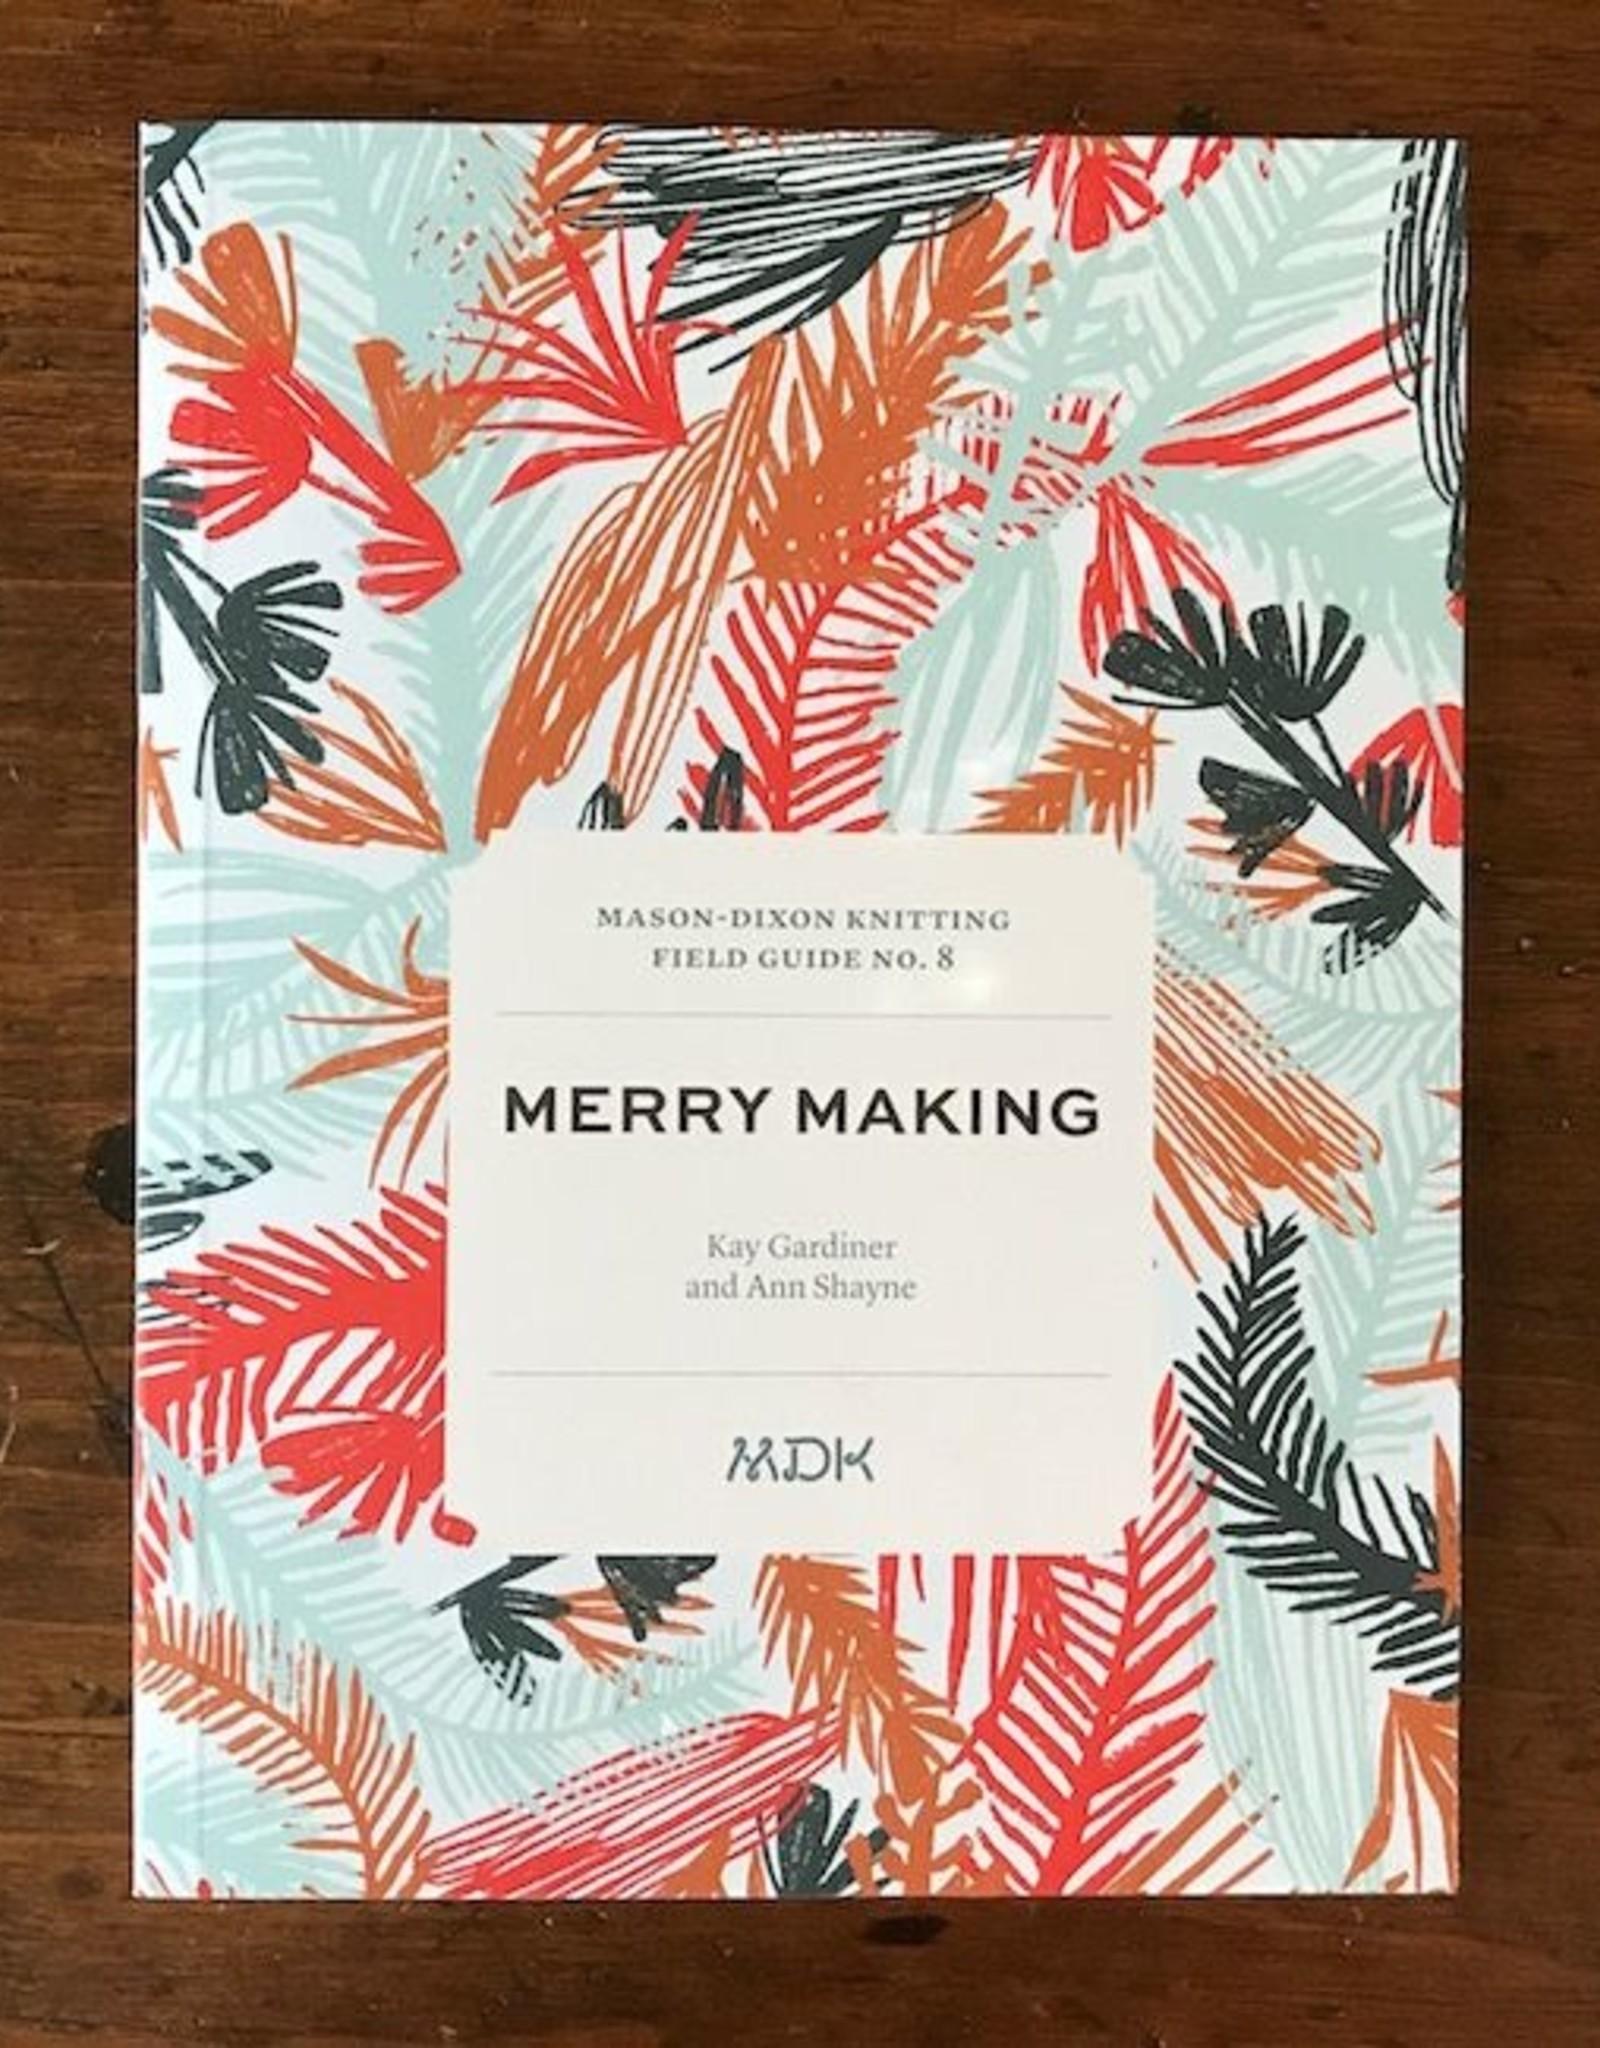 Mason-Dixon Knitting MDK Field Guide no. 8: Merry Making